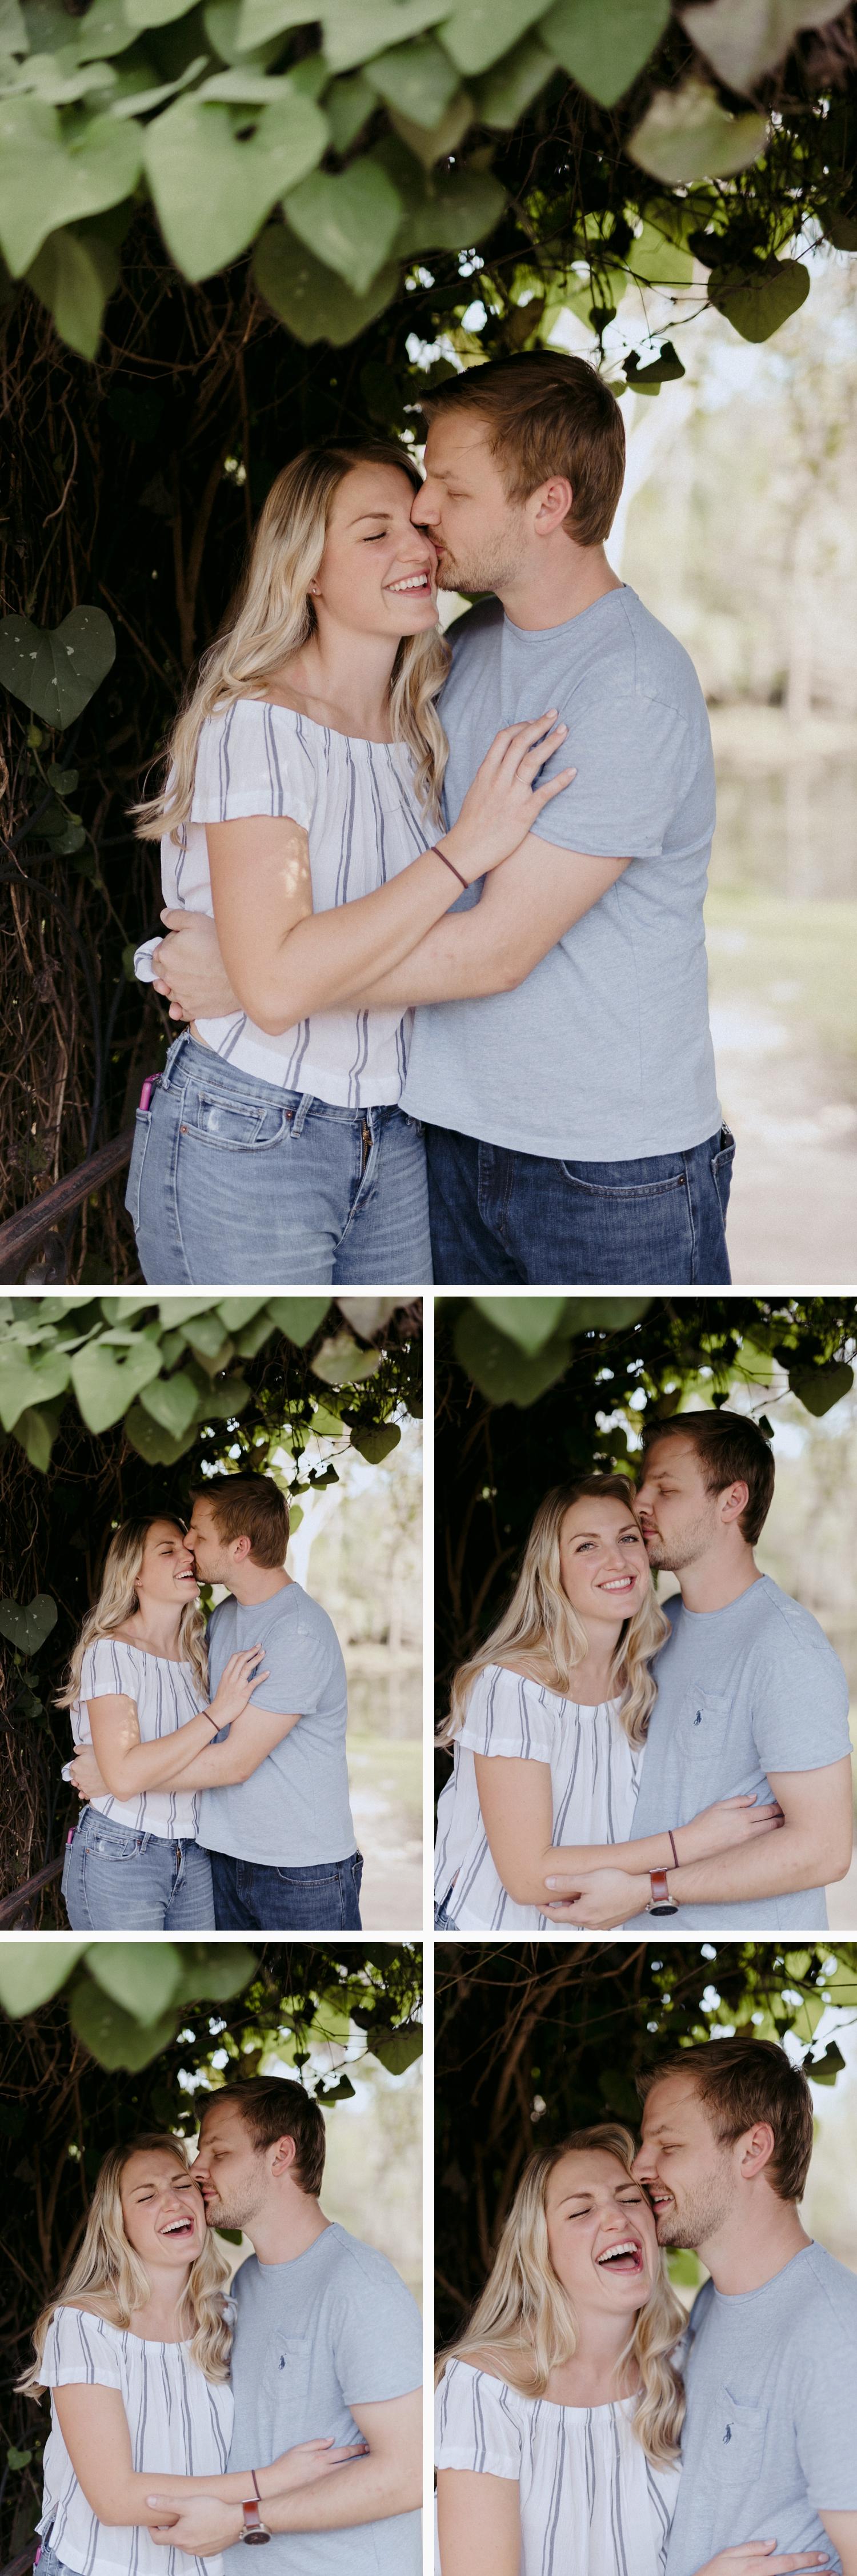 Kylie-And-Jack-Mead-Botanical-Garden-Engagement_0001.jpg